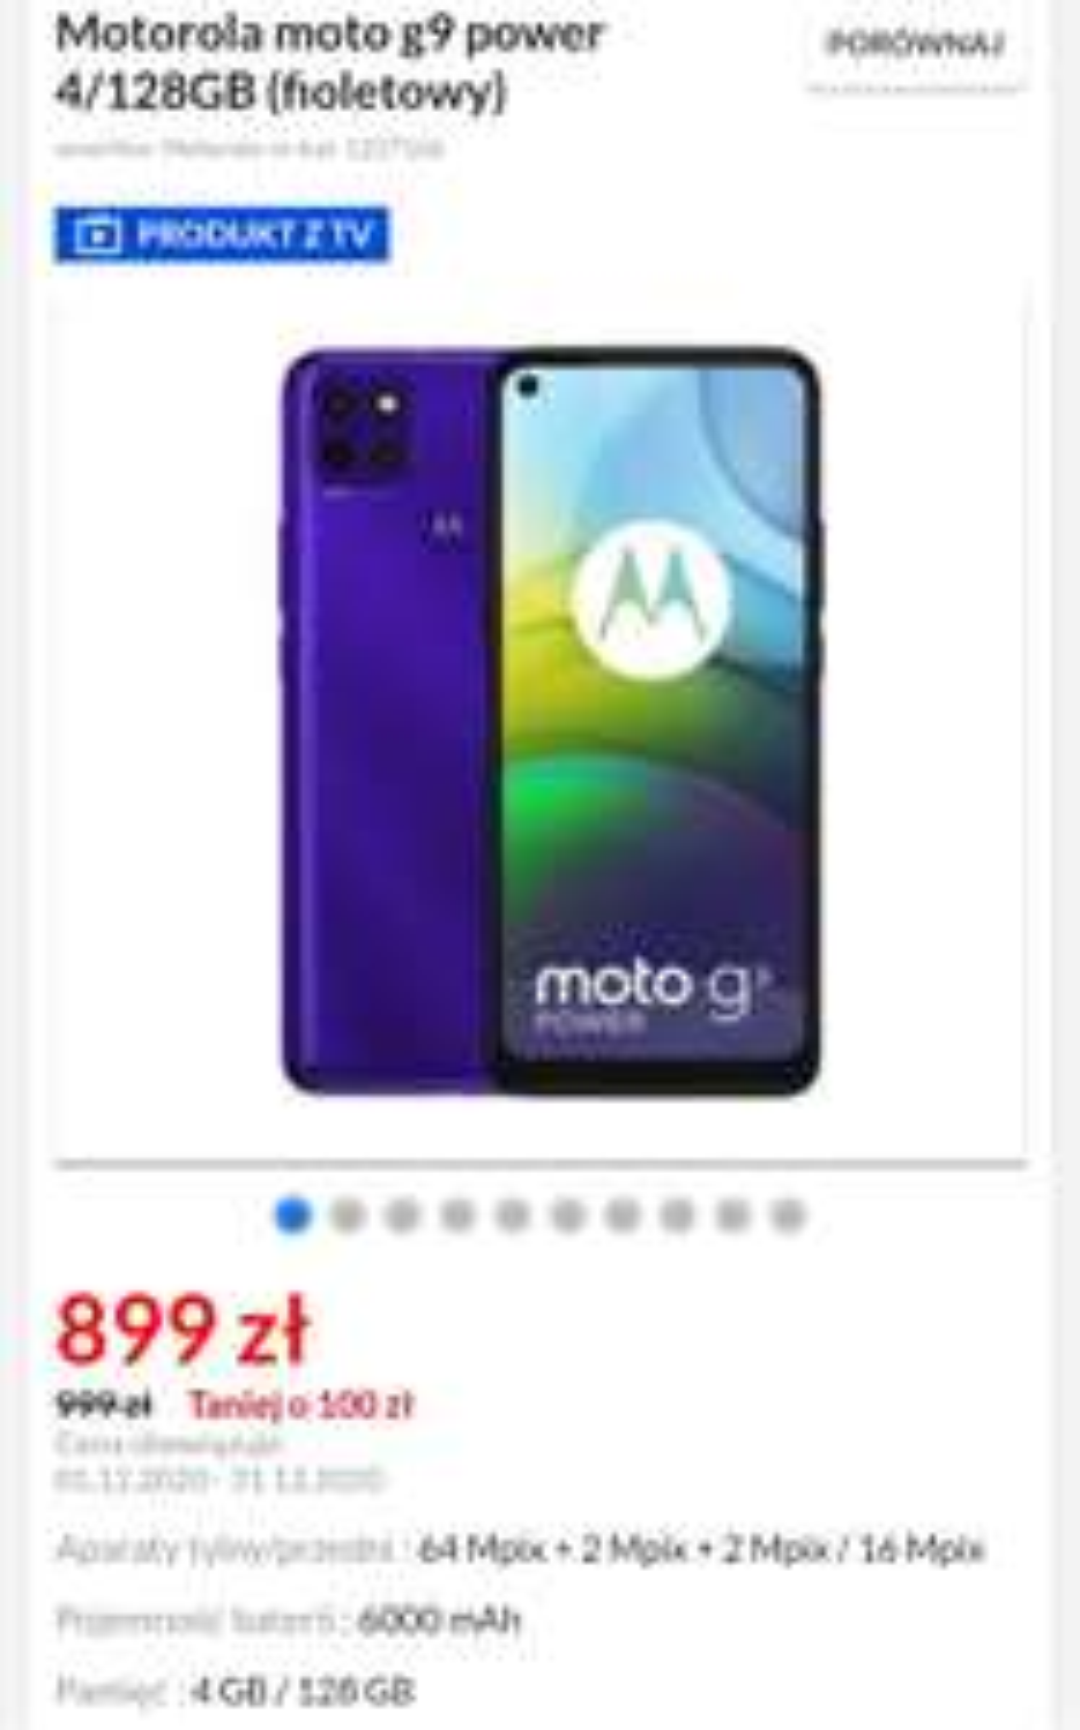 Motorola moto g9 power 4/128GB (fioletowy)